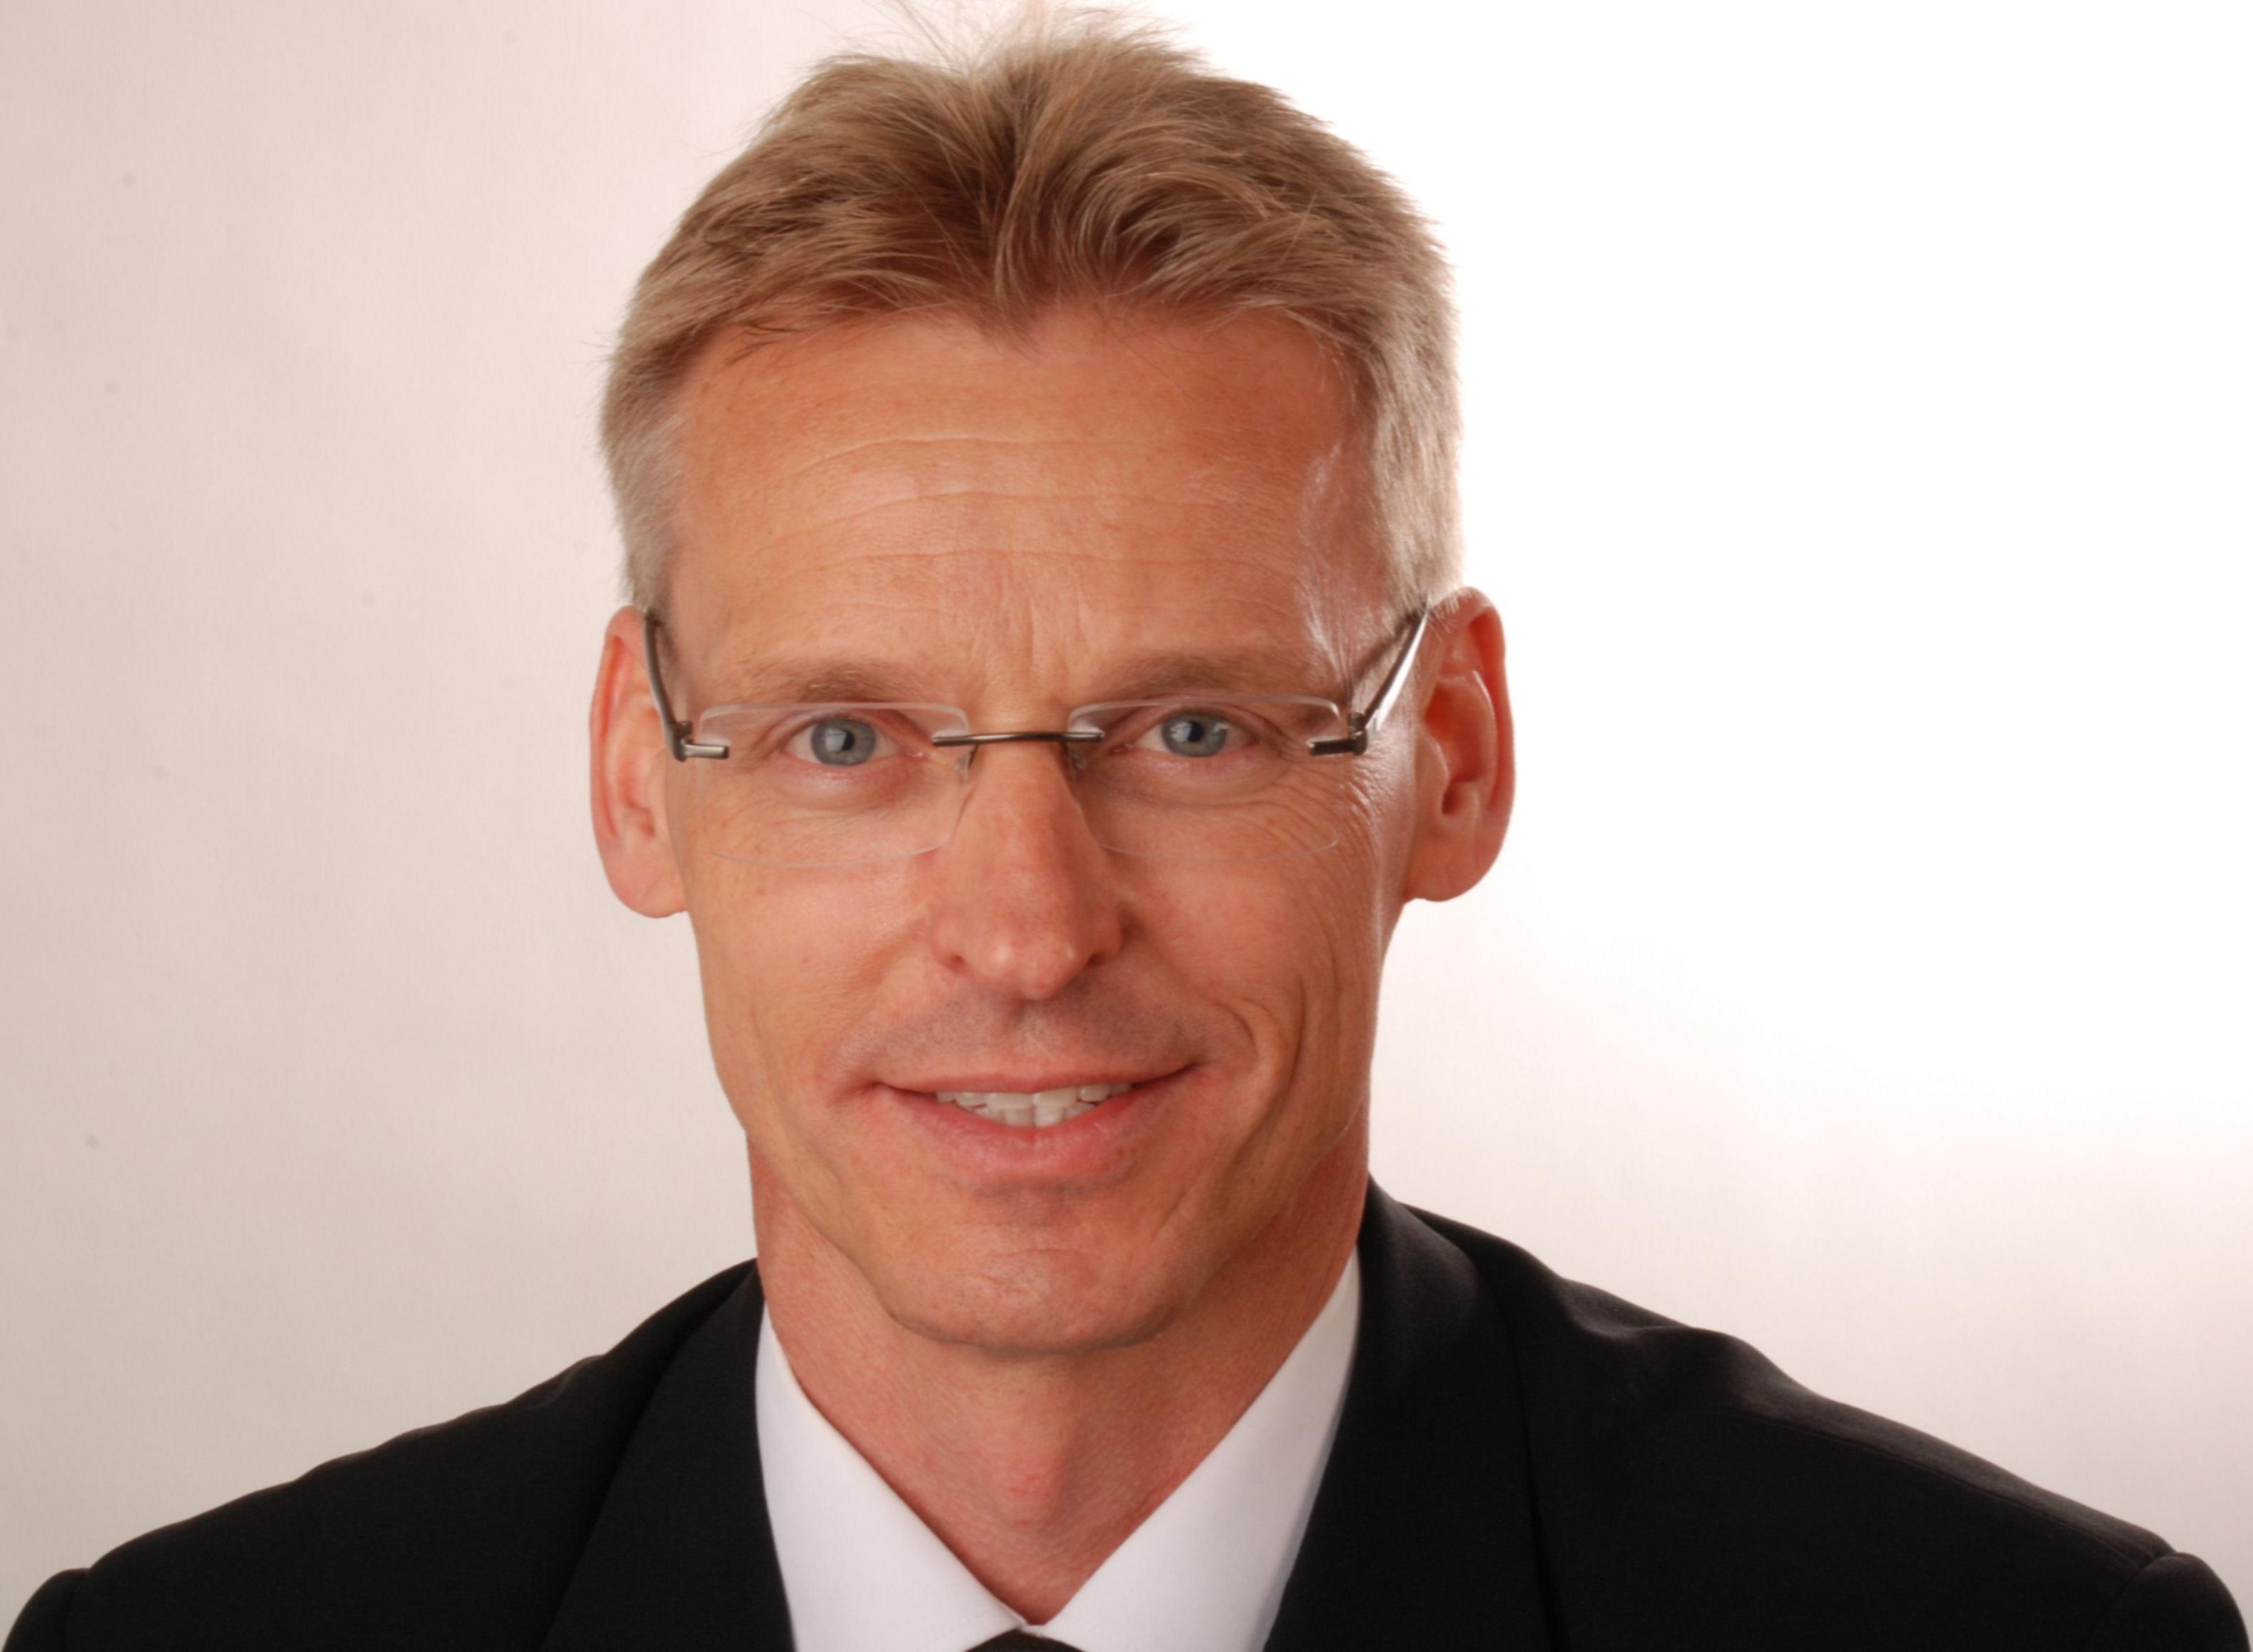 Dr. Martin Schindler